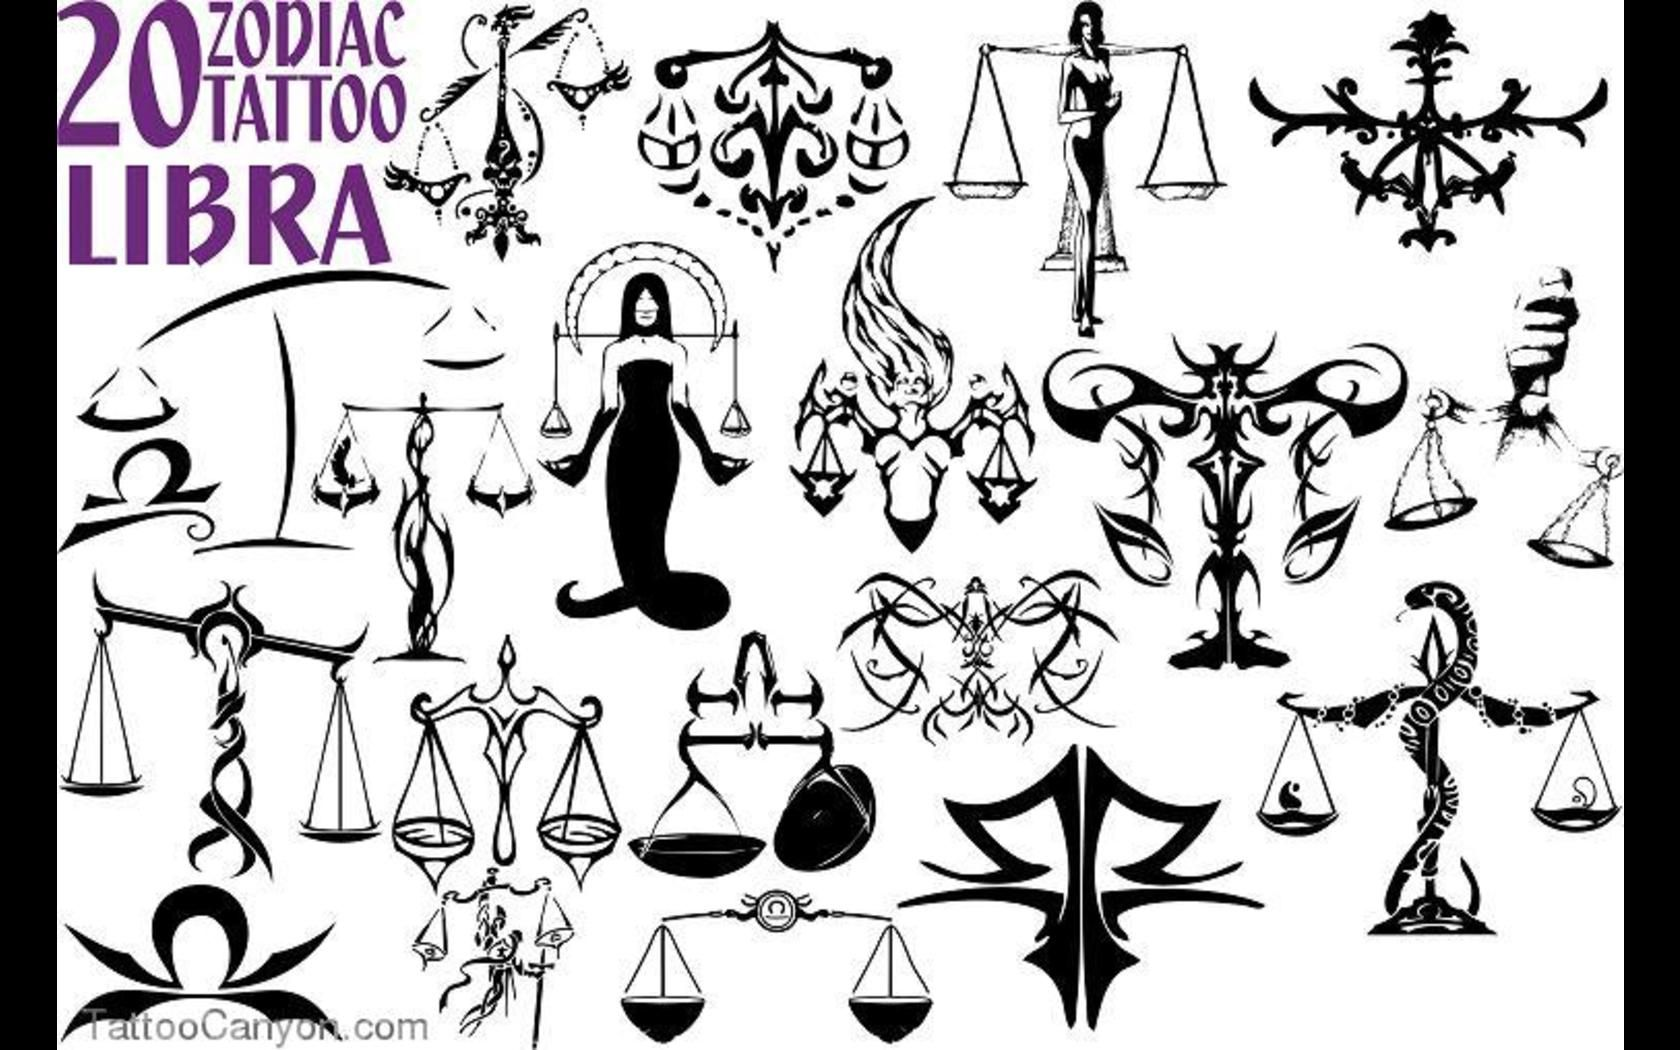 Libra Zodiac Sign Tattoo Designs Libra Zodiac Sign Tattoo Designs